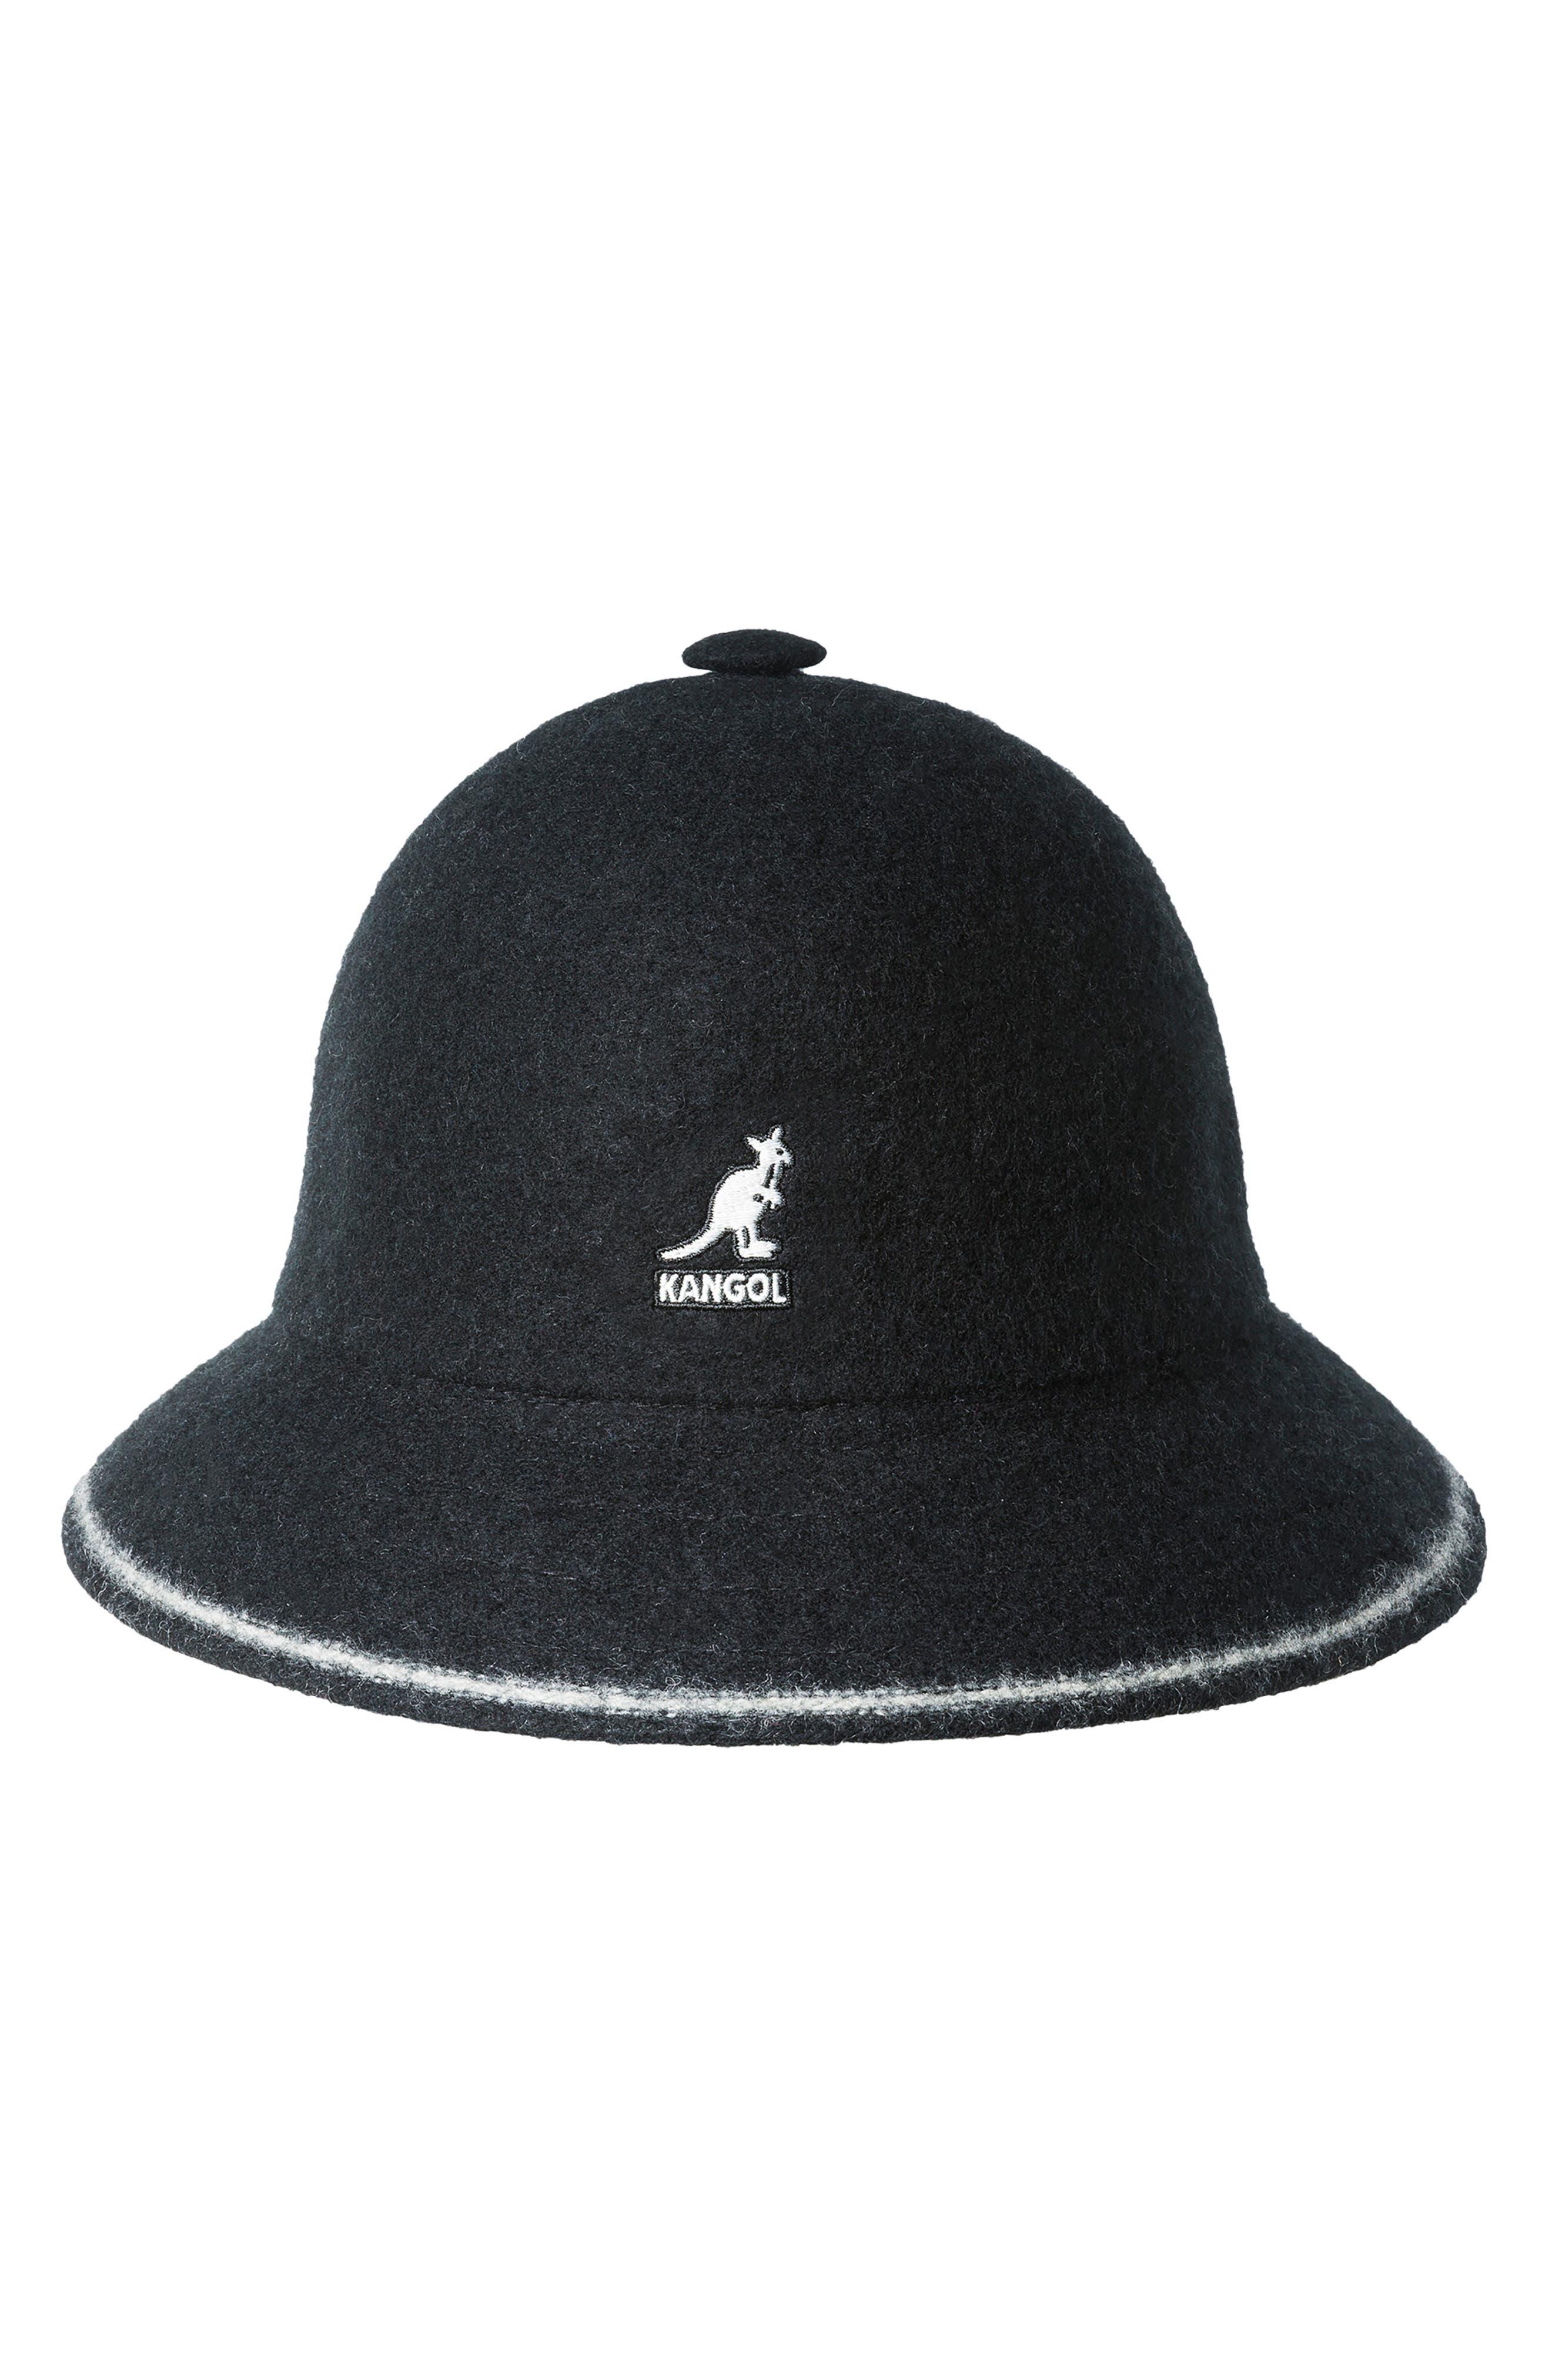 KANGOL Cloche Hat - Black in Blk/ Off Wht